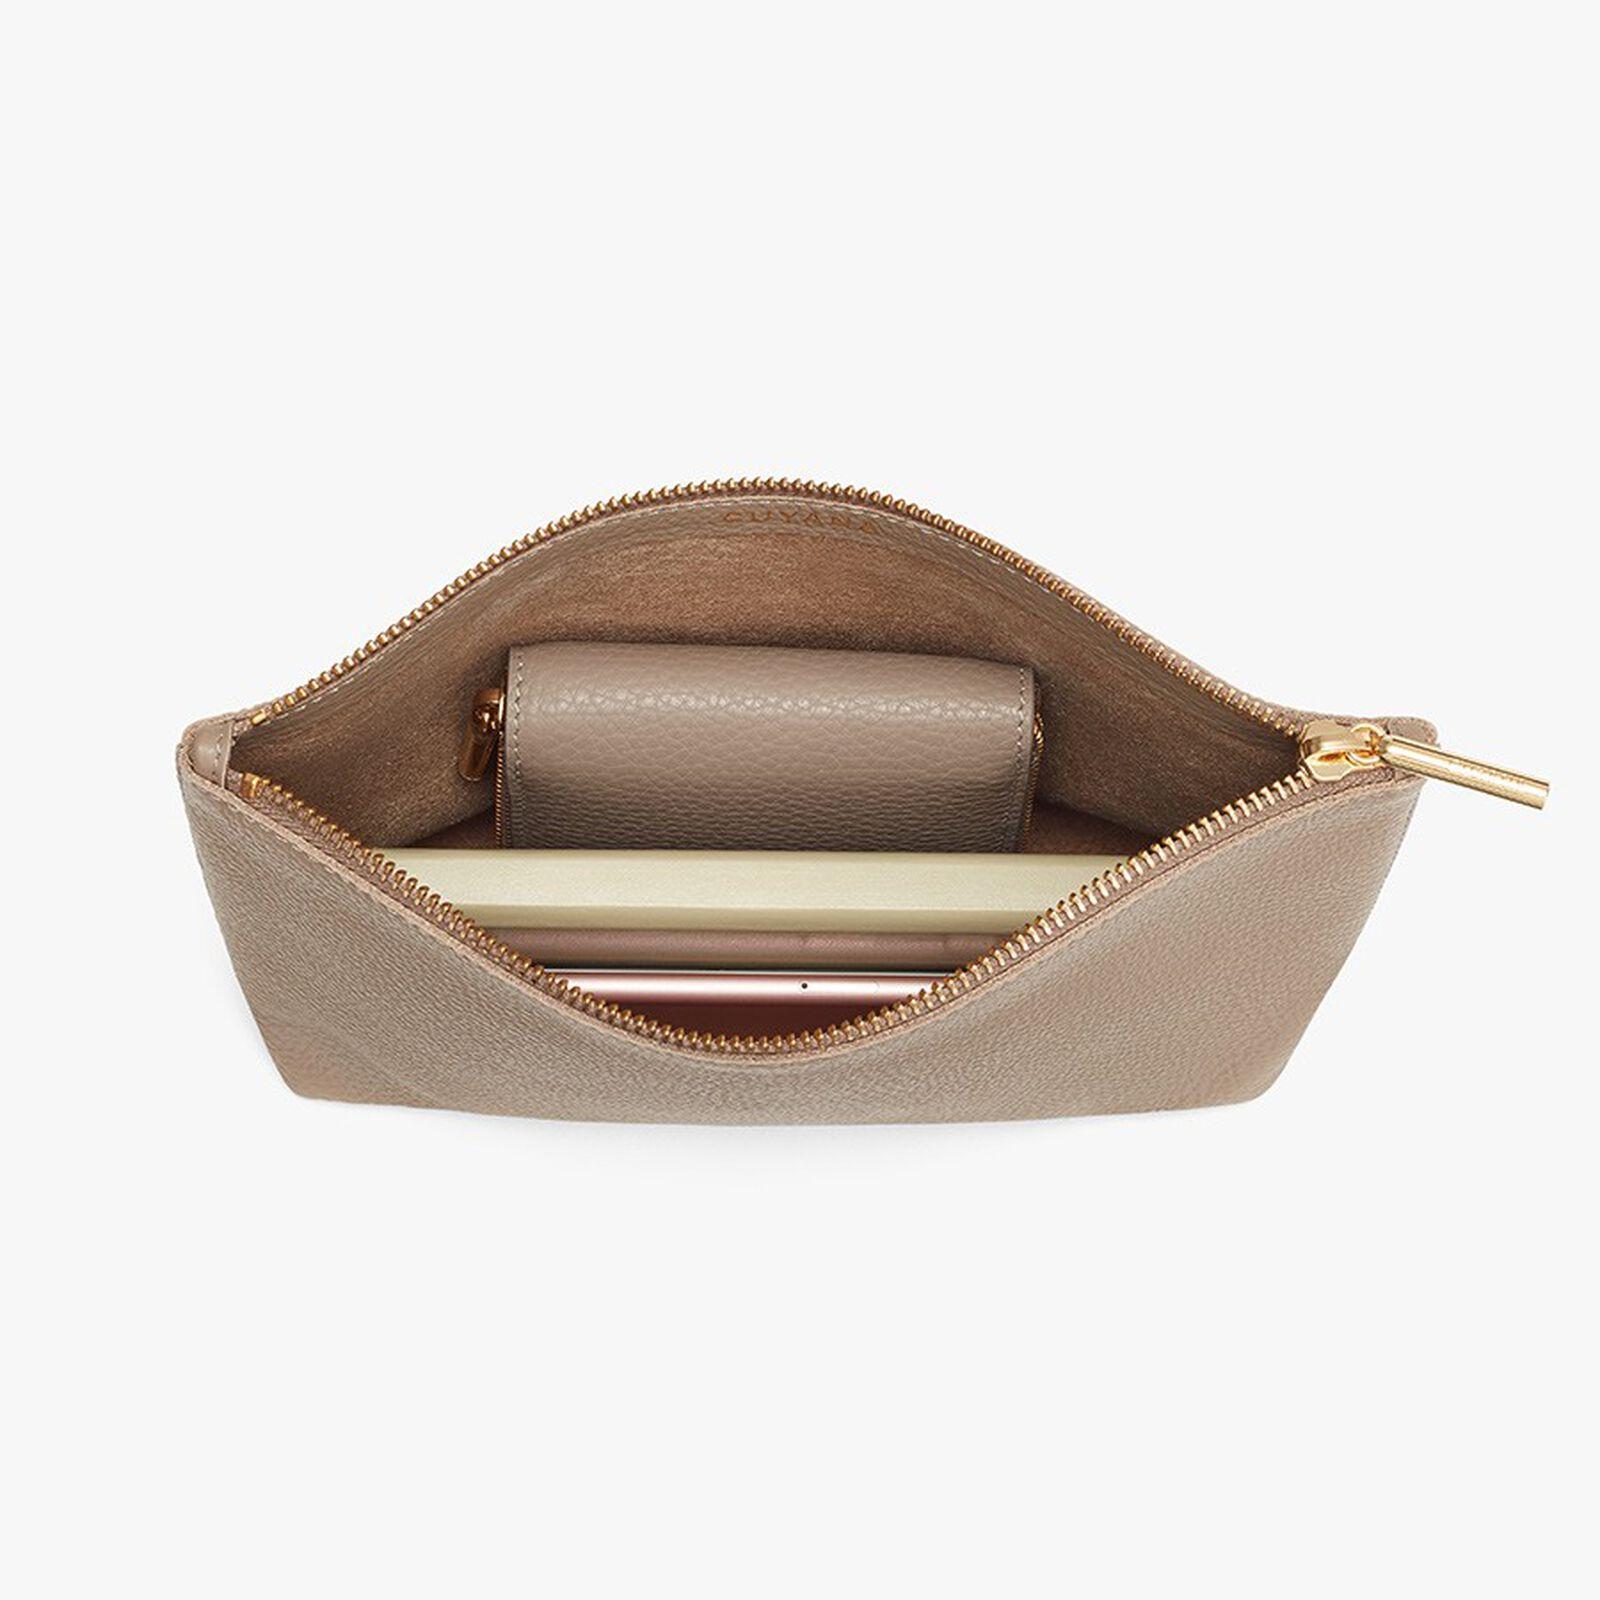 Tiny zip purse mini pouch